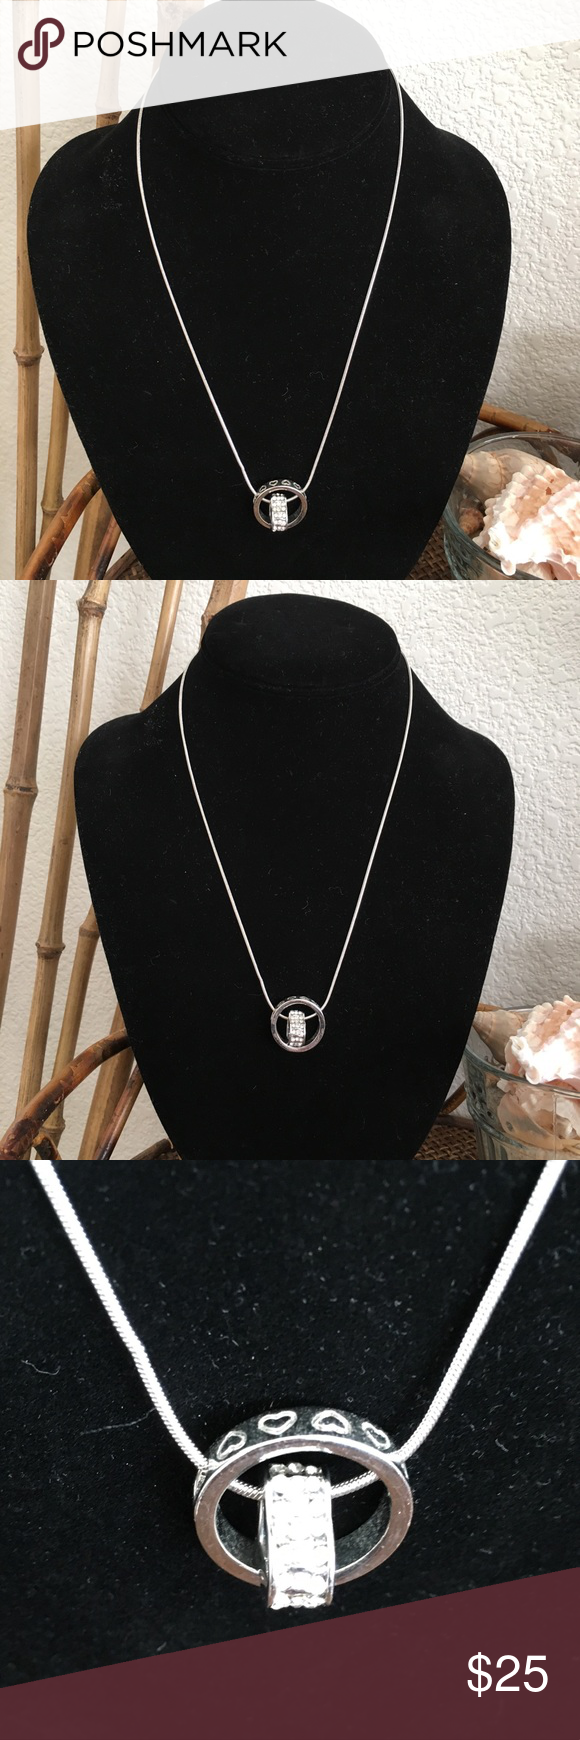 Macy S 18kgp White Gold Heart Rhinestone Necklace Rhinestone Necklace Macys Jewelry Necklace